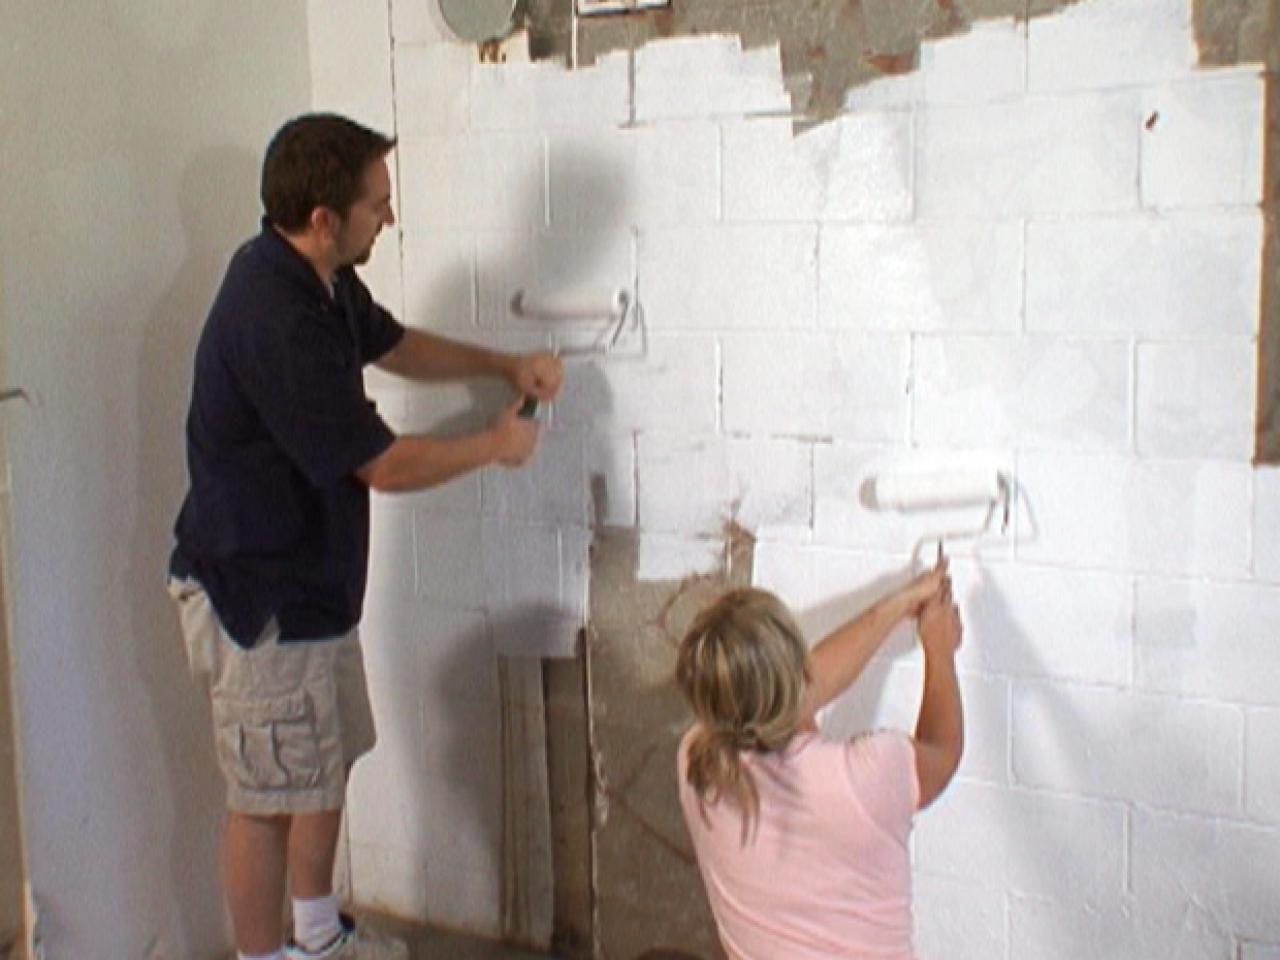 How To Waterproof A Cinderblock Wall Waterproofing Basement Cinder Block Walls Concrete Block Walls